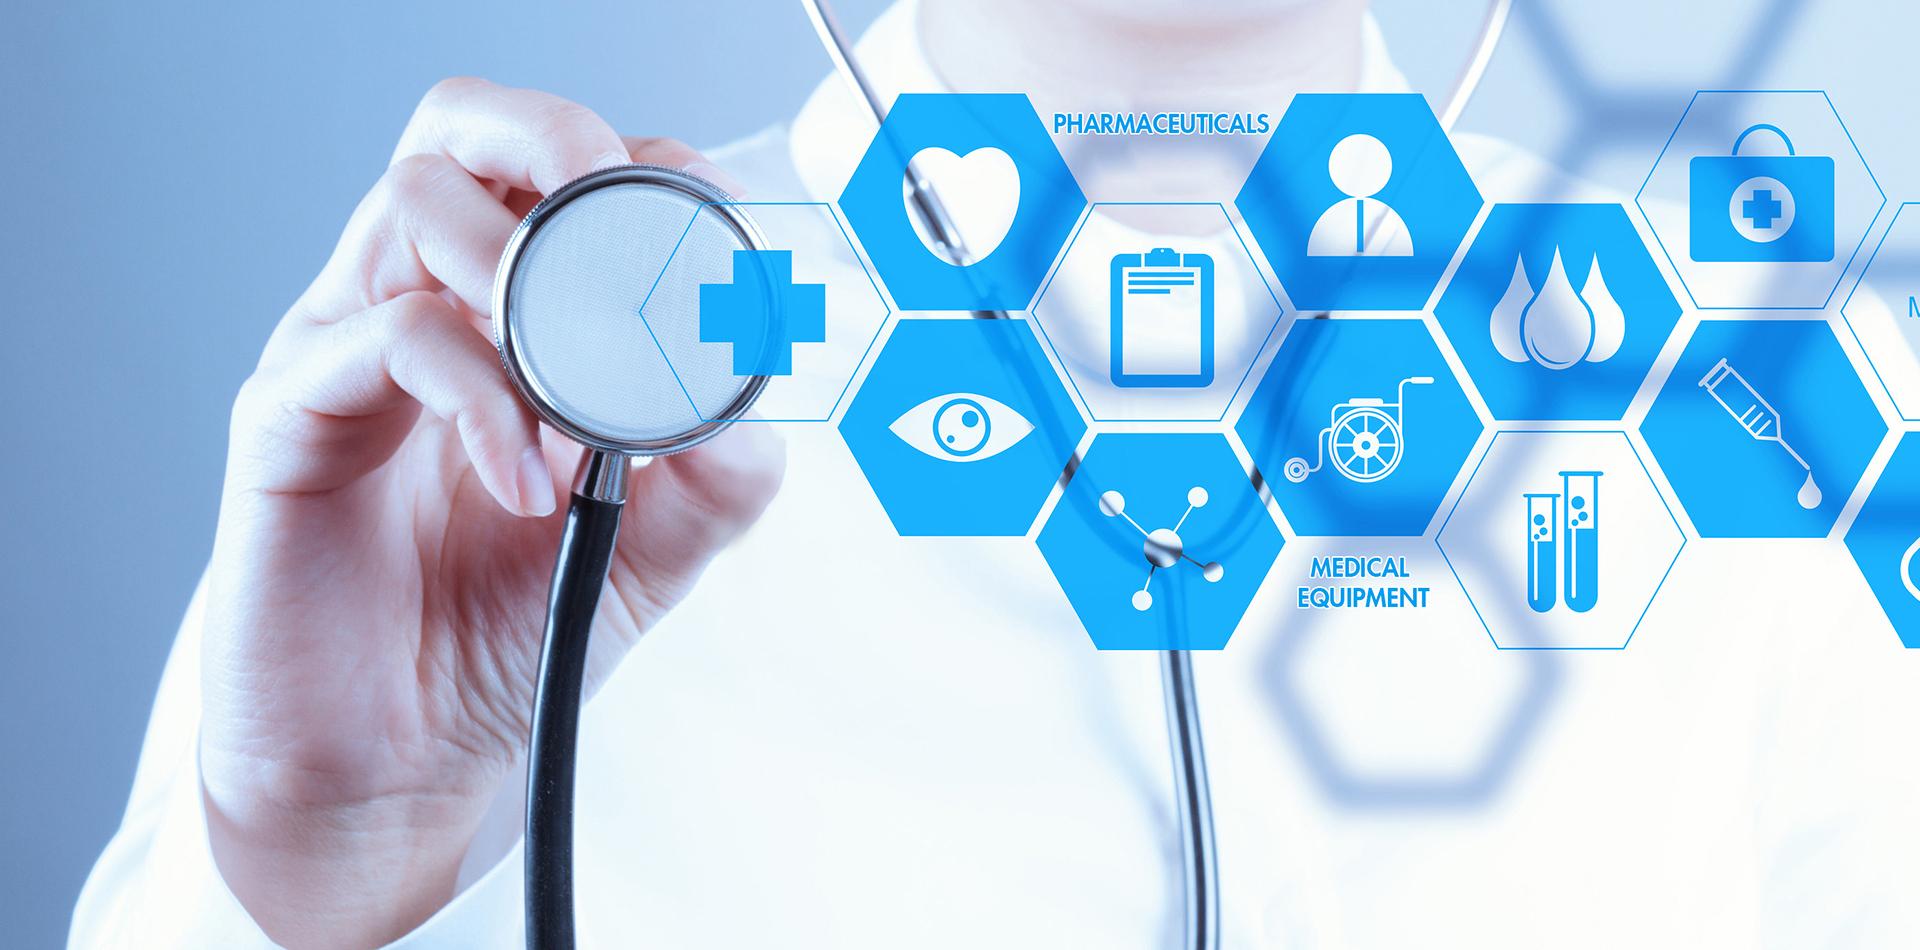 Dược phẩm & thiết bị y tế